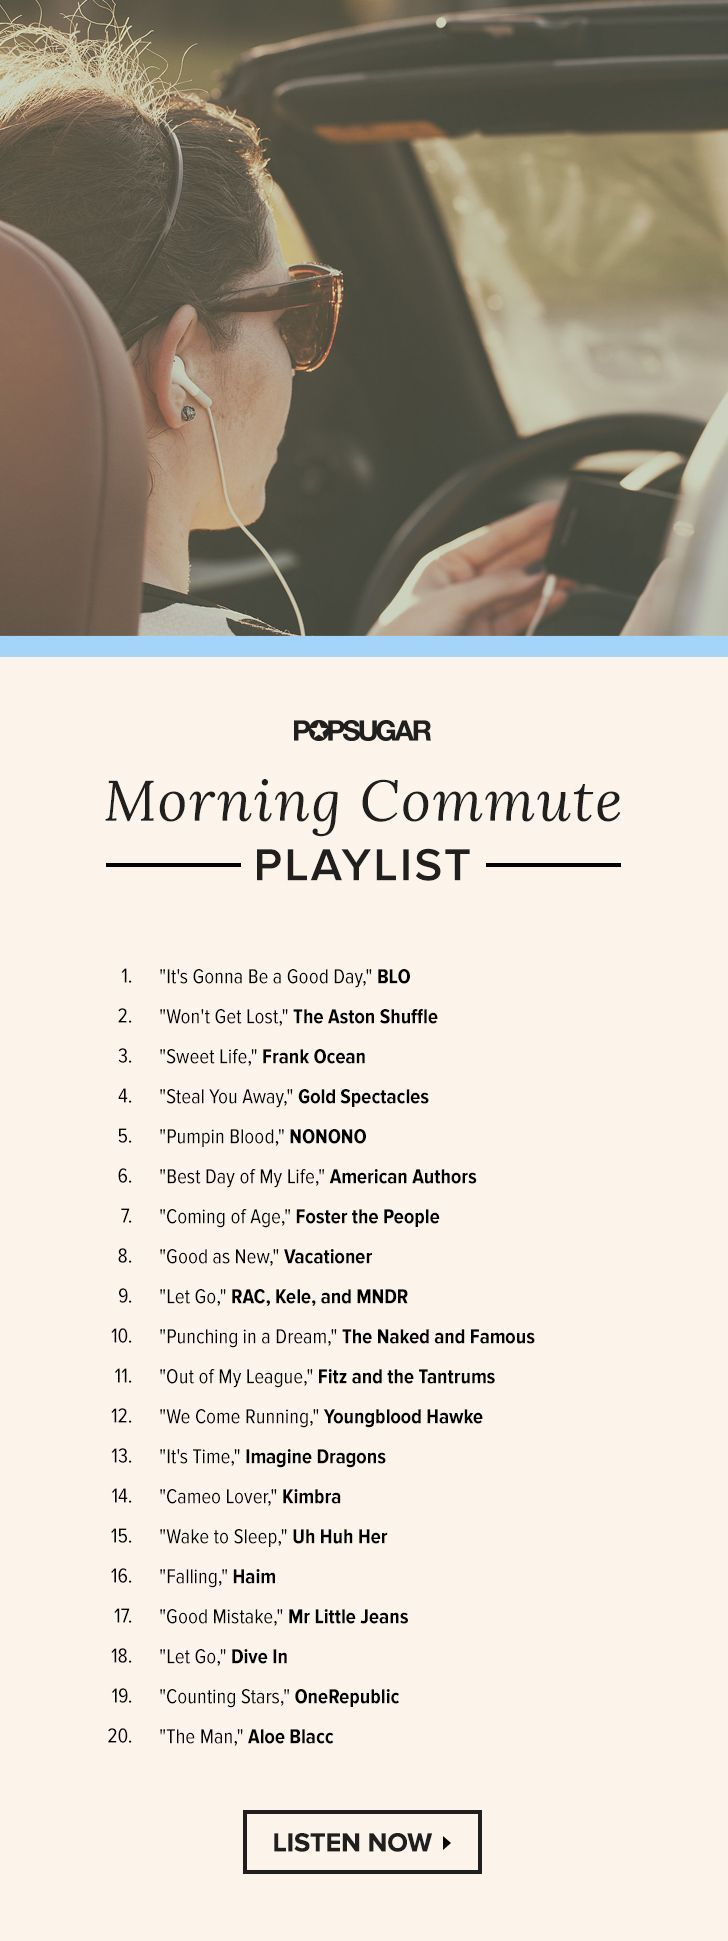 Musik, um dem Morgen zu entkommen  #entkommen #morgen #musik